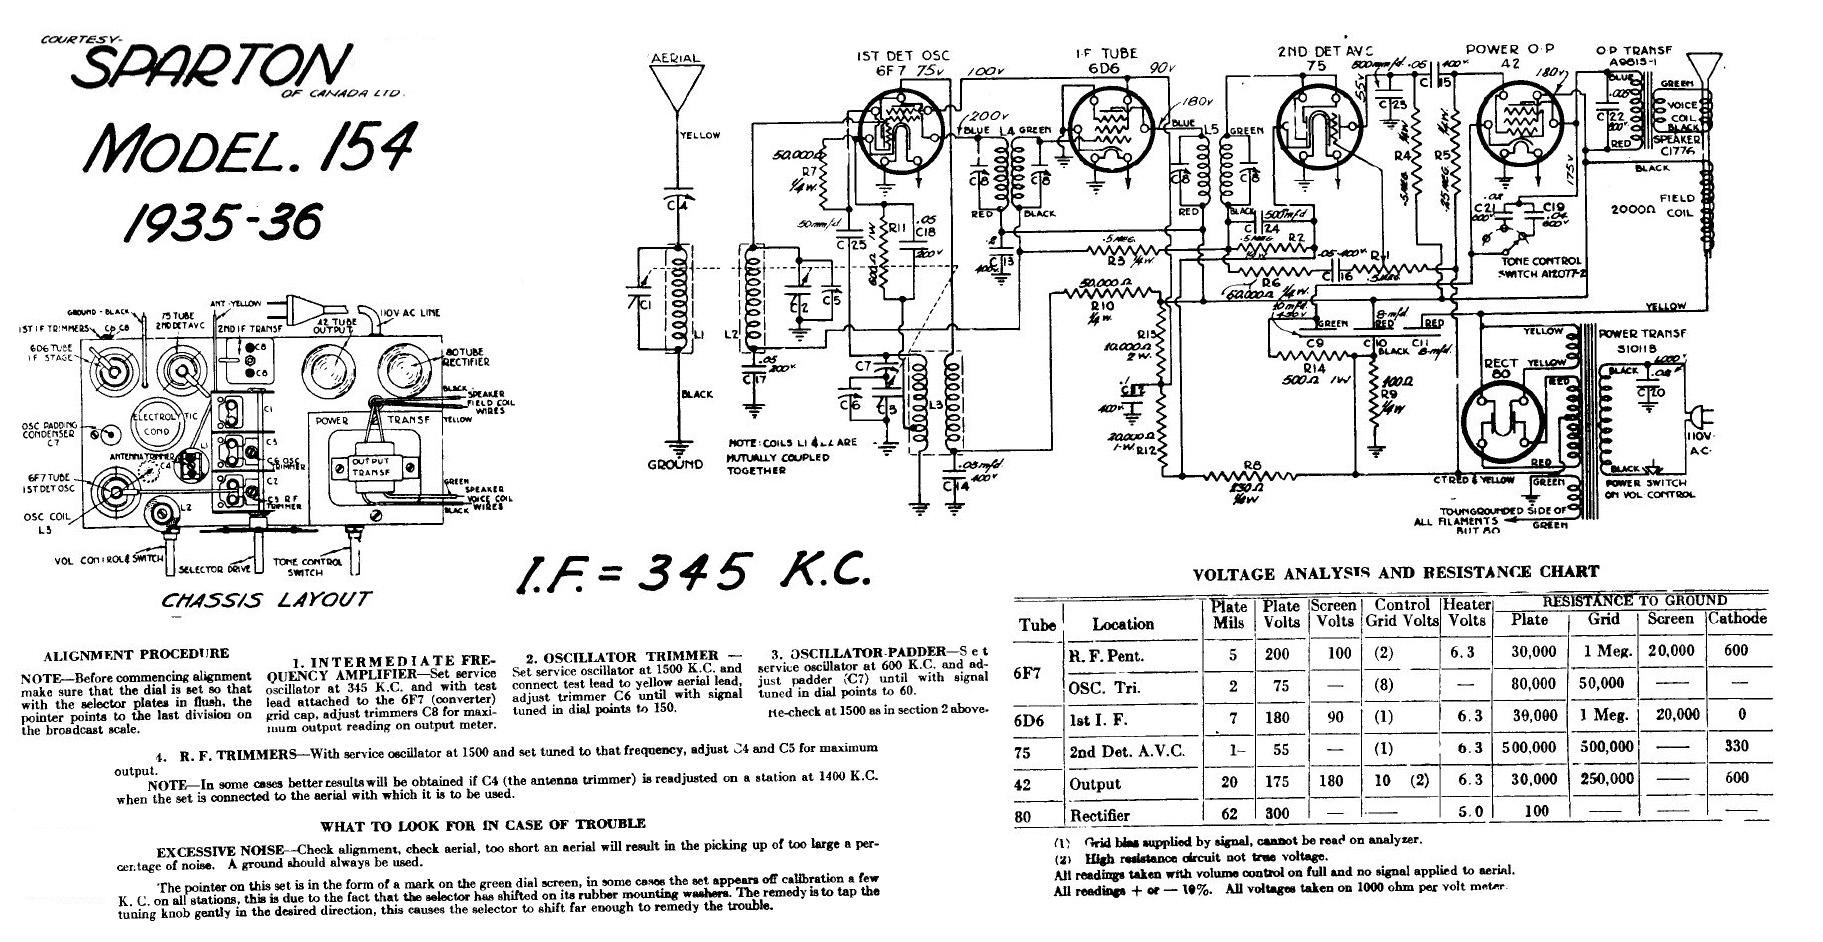 1983 mazda rx 7 fuse box diagram on 83 mazda b2000 wiring diagram